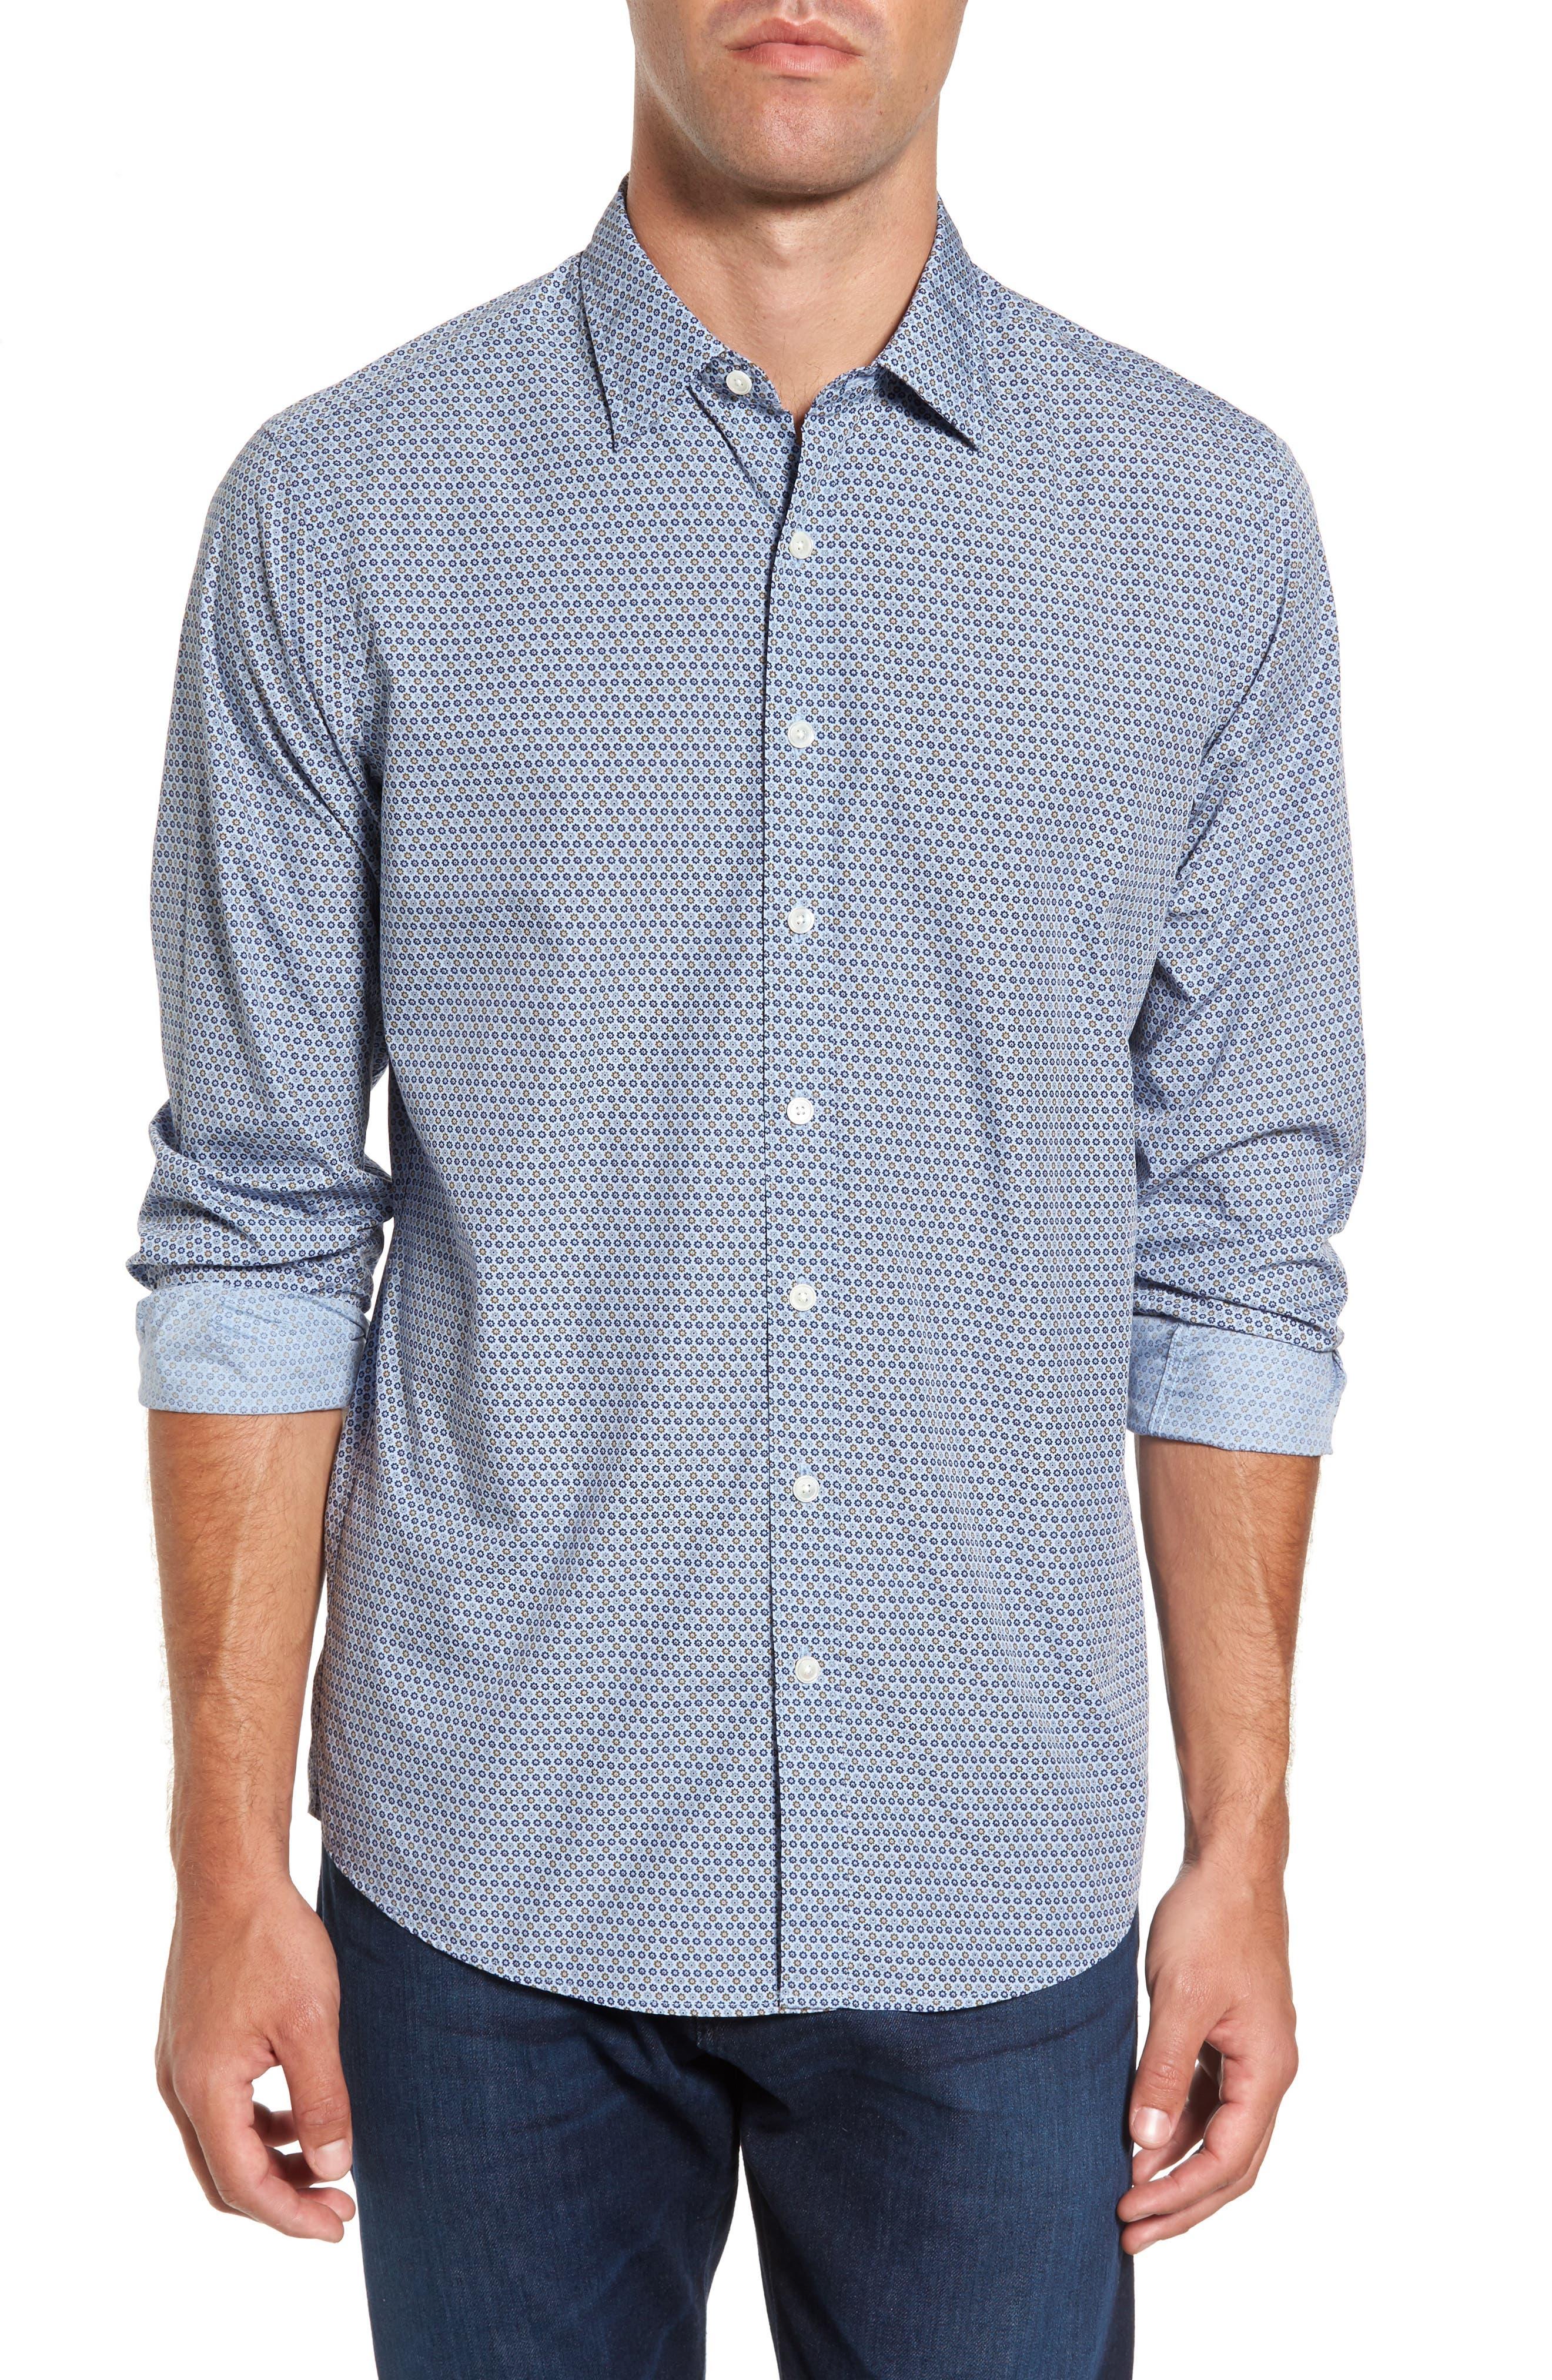 Alternate Image 1 Selected - Rodd & Gunn Horseshoe Bay Sports Fit Print Sport Shirt